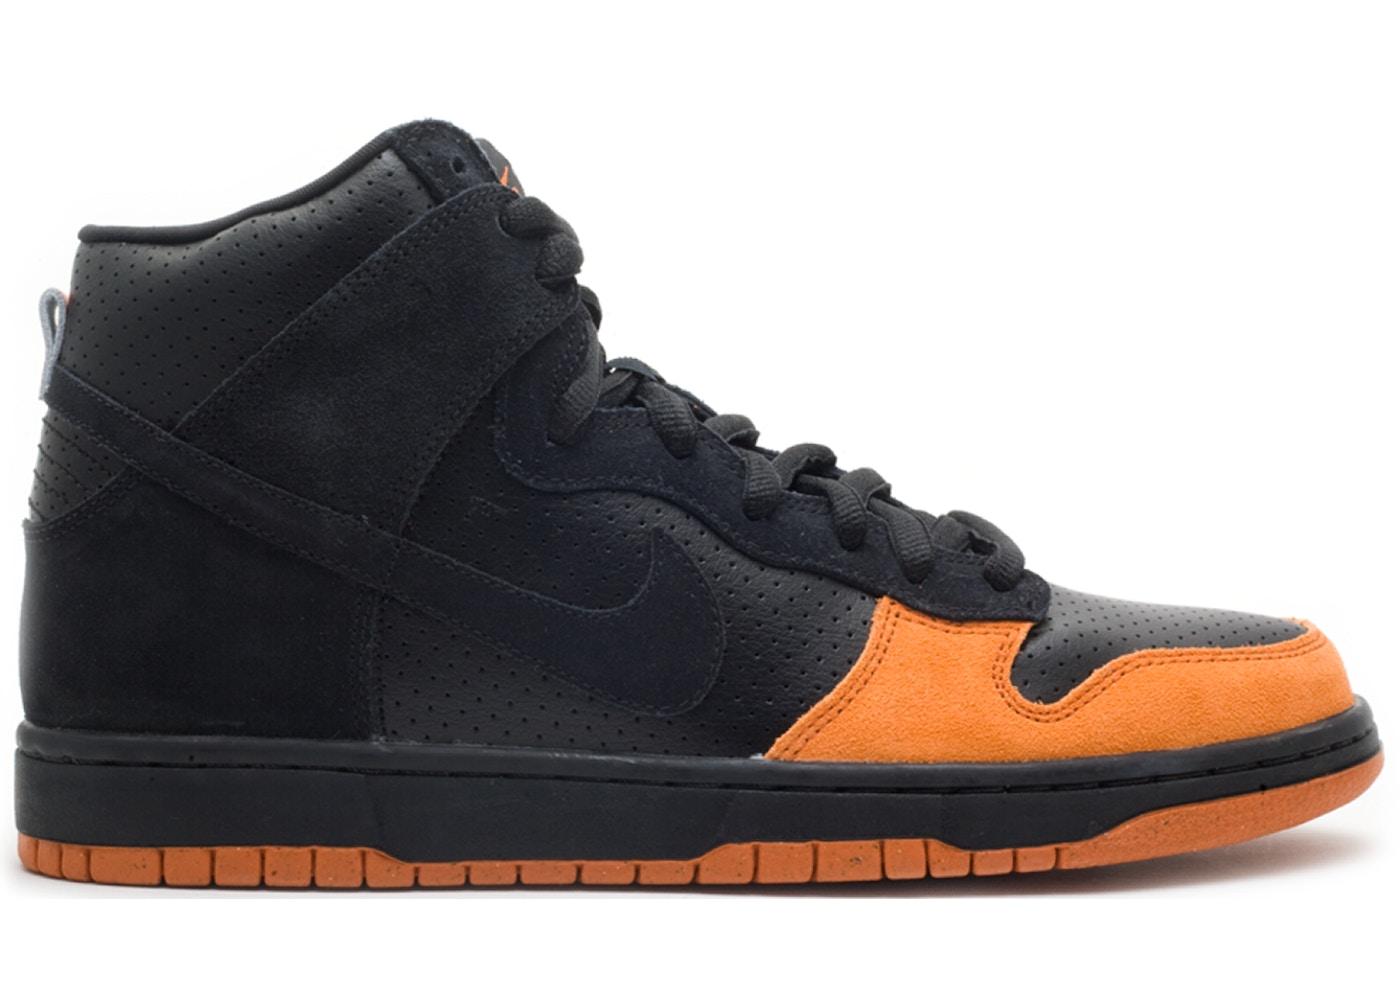 Nike SB Dunk High Black Solar Orange